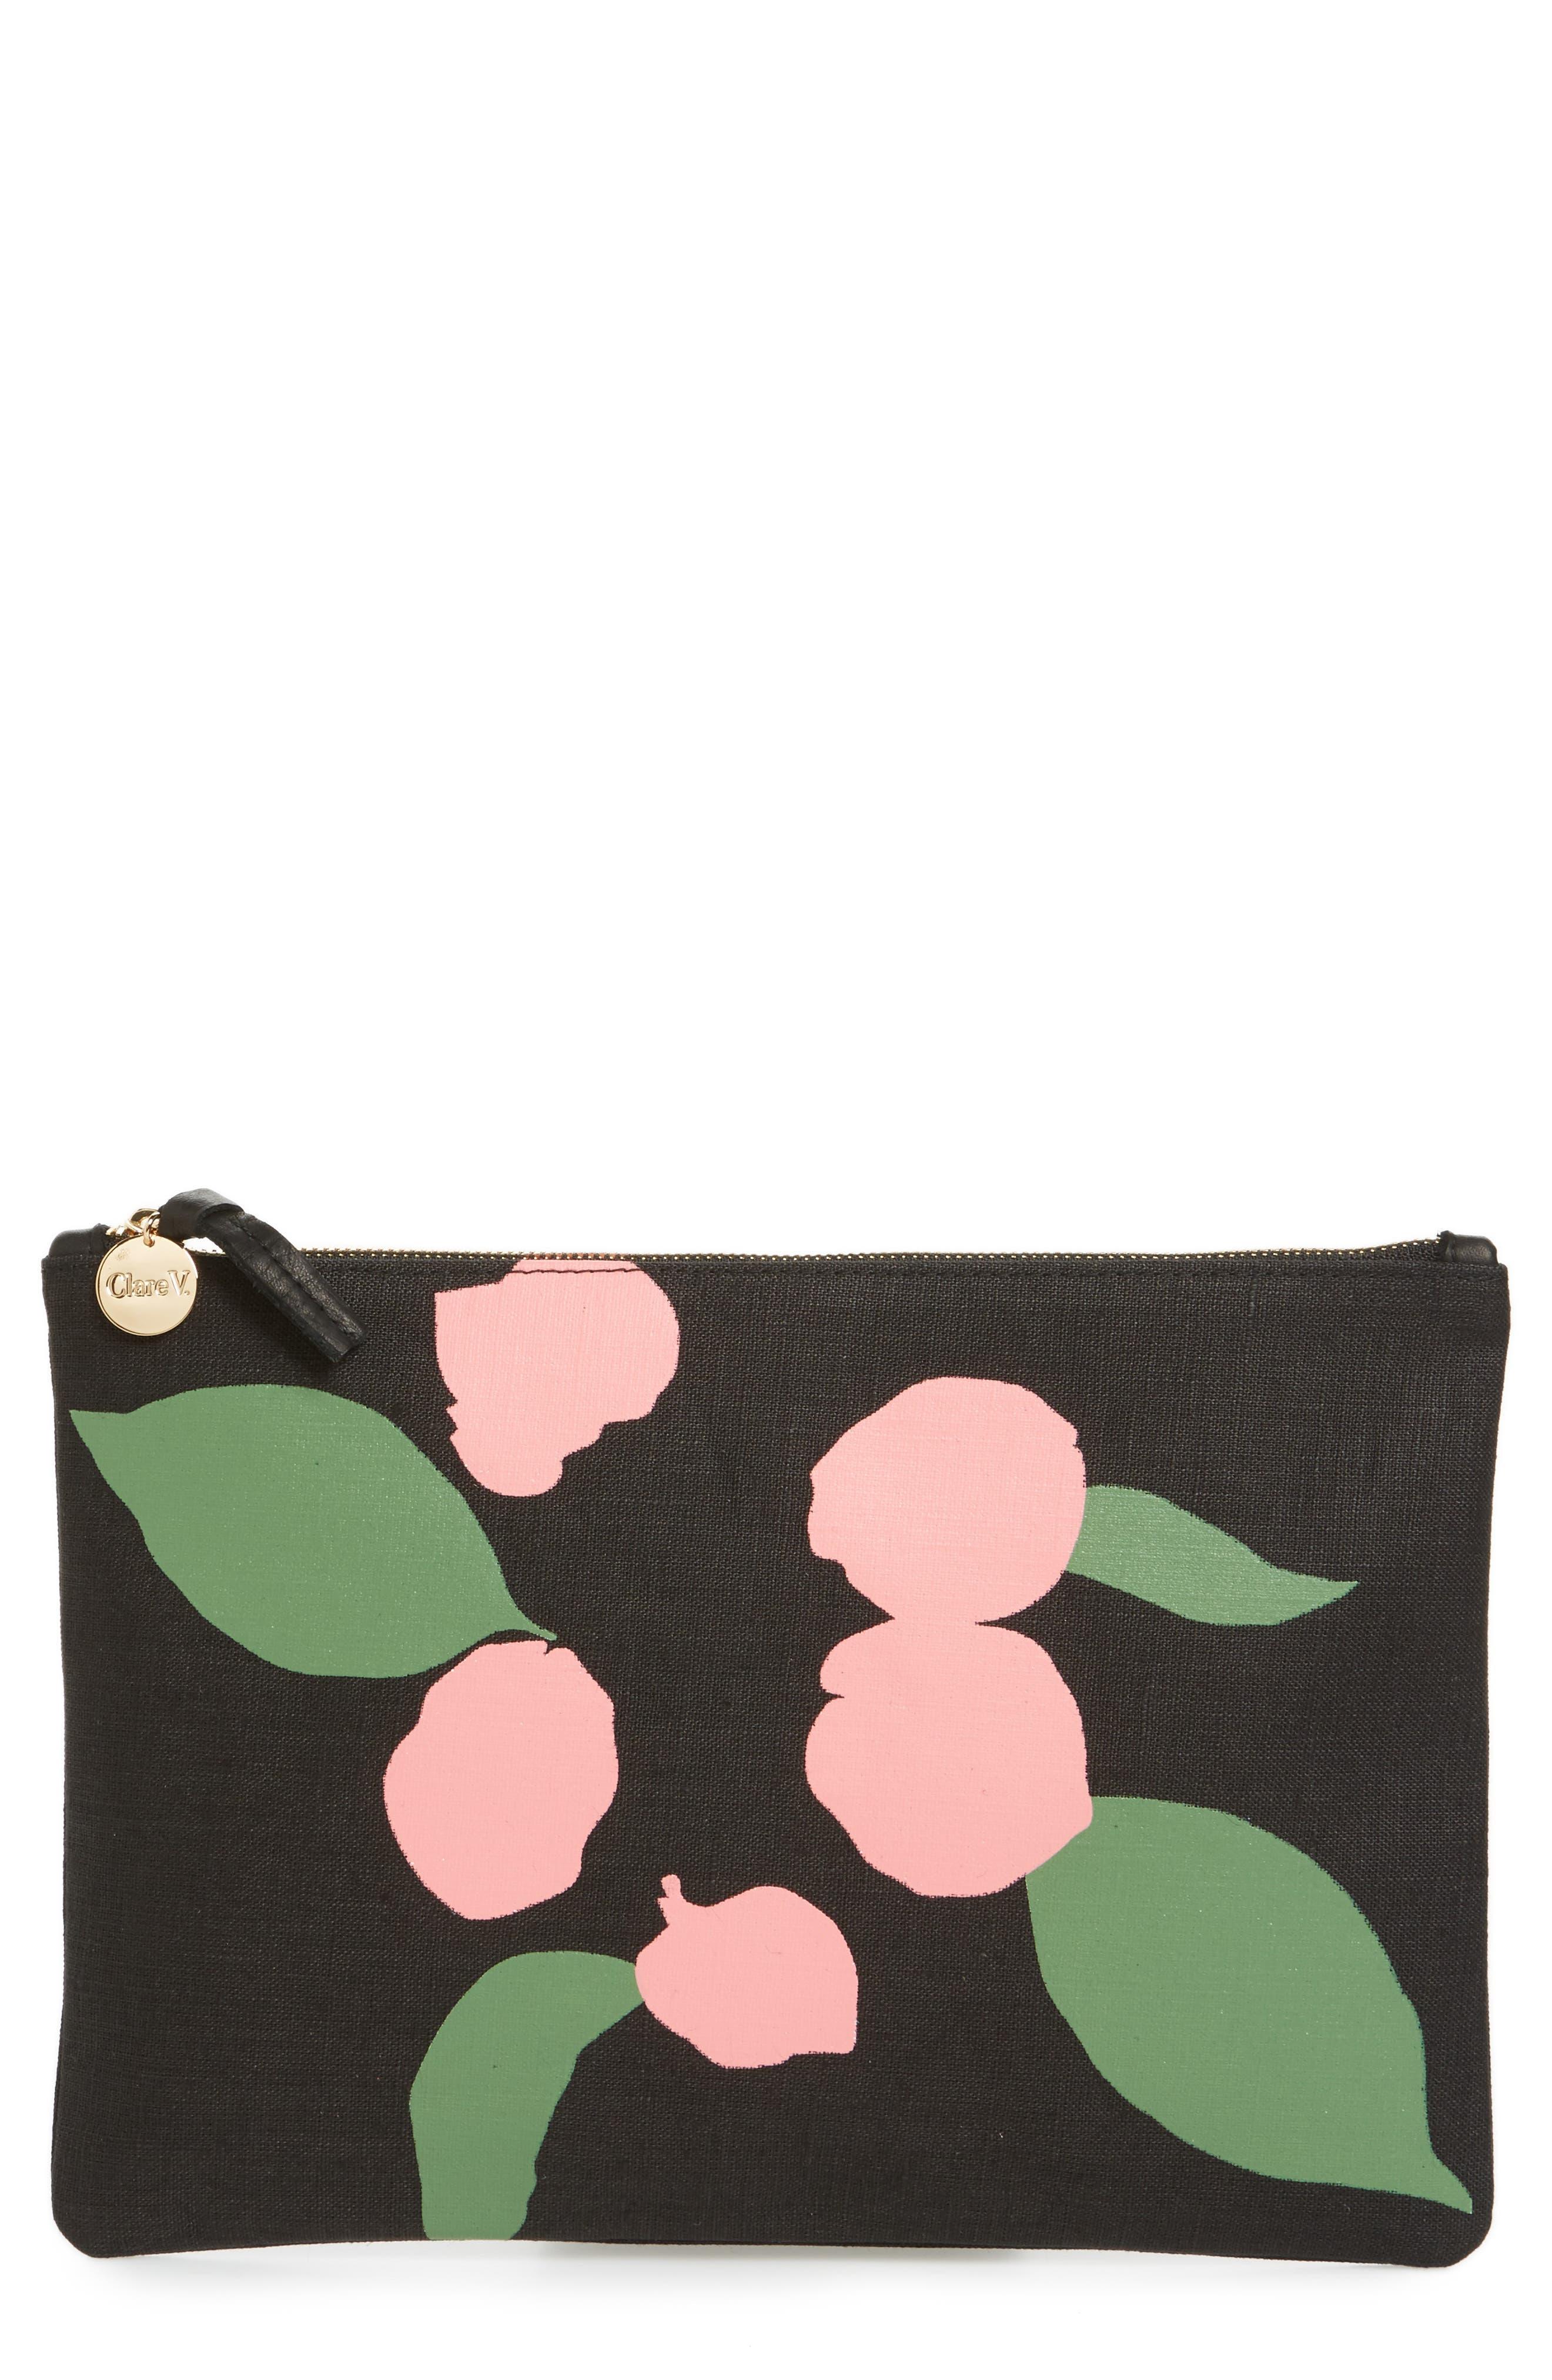 Bougainvillea Linen Clutch,                         Main,                         color, Black Linen With Pink